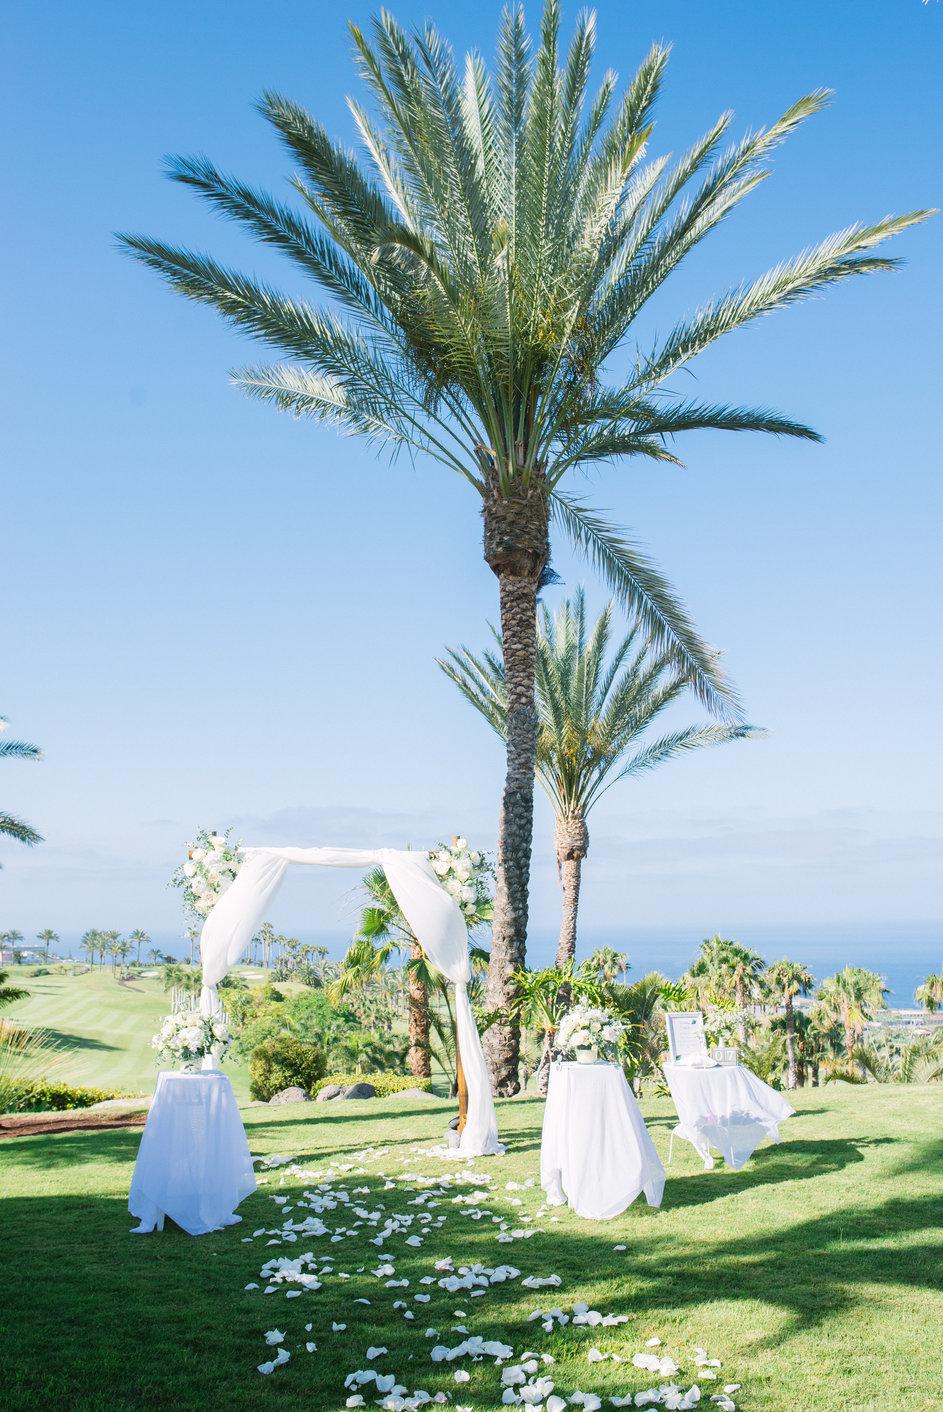 rsz_wedding_planner_tenerife11.jpg